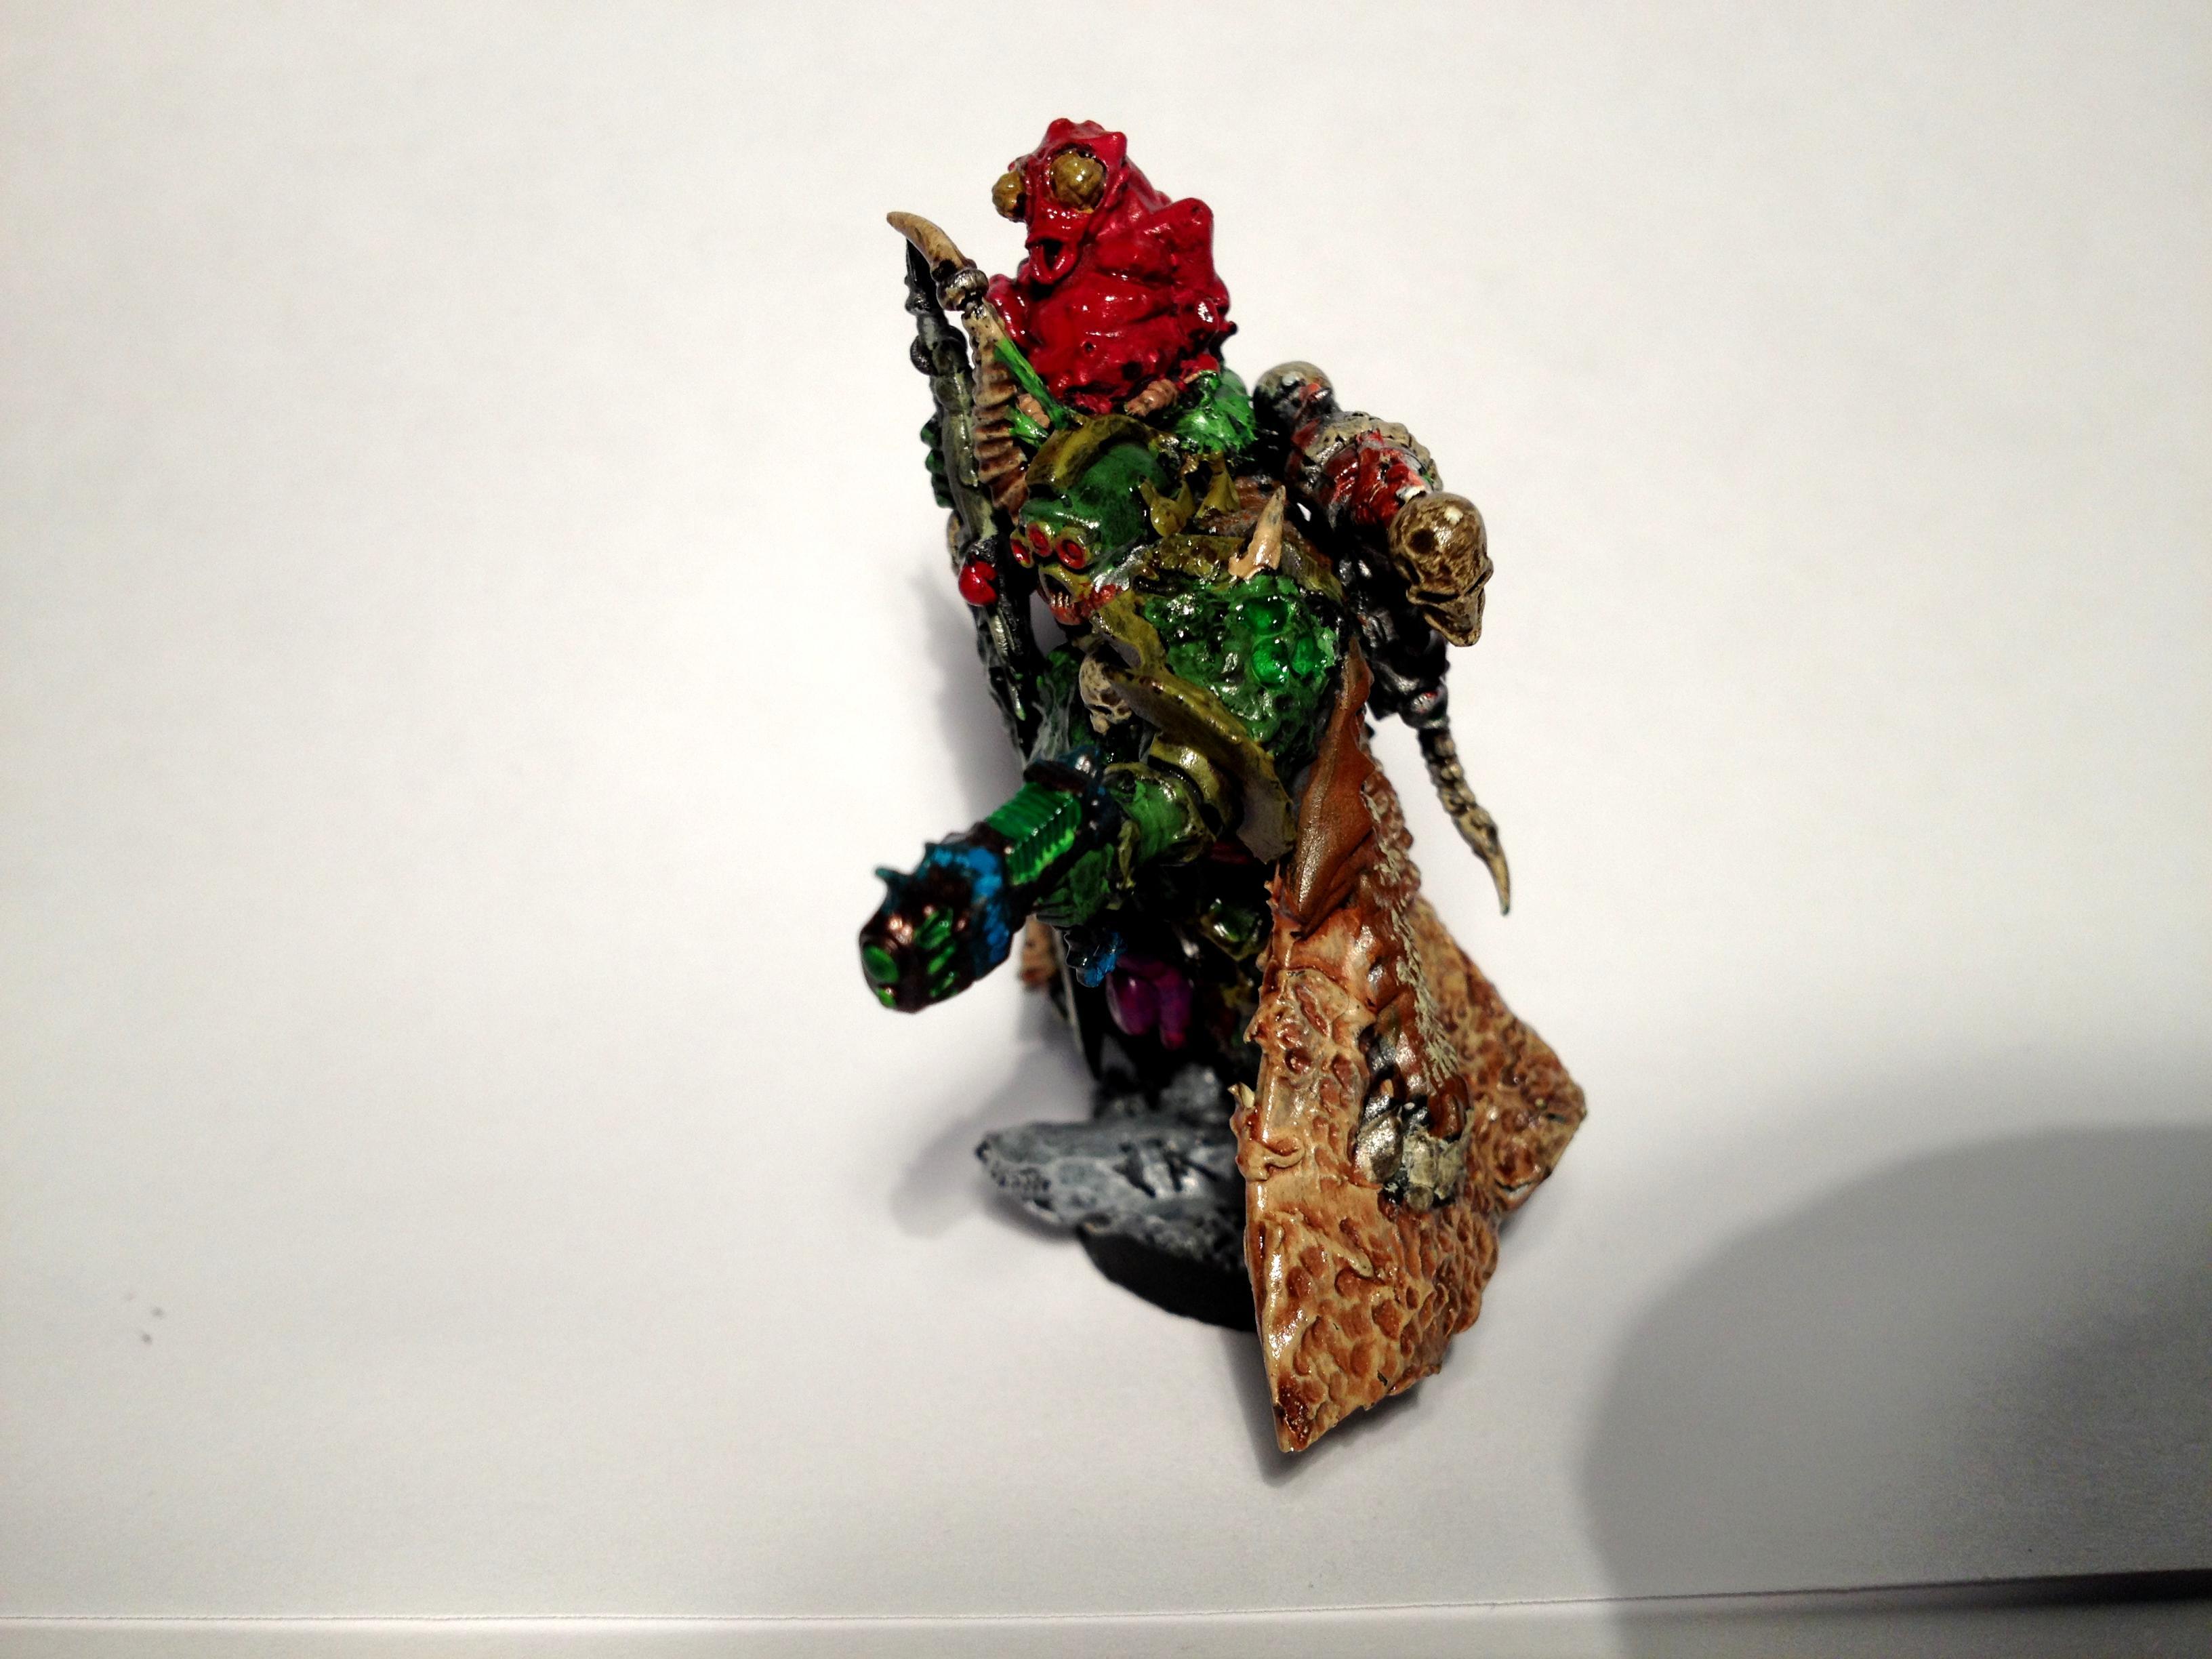 Chaos Space Marines, Dv, Nurgle, Warhammer 40,000